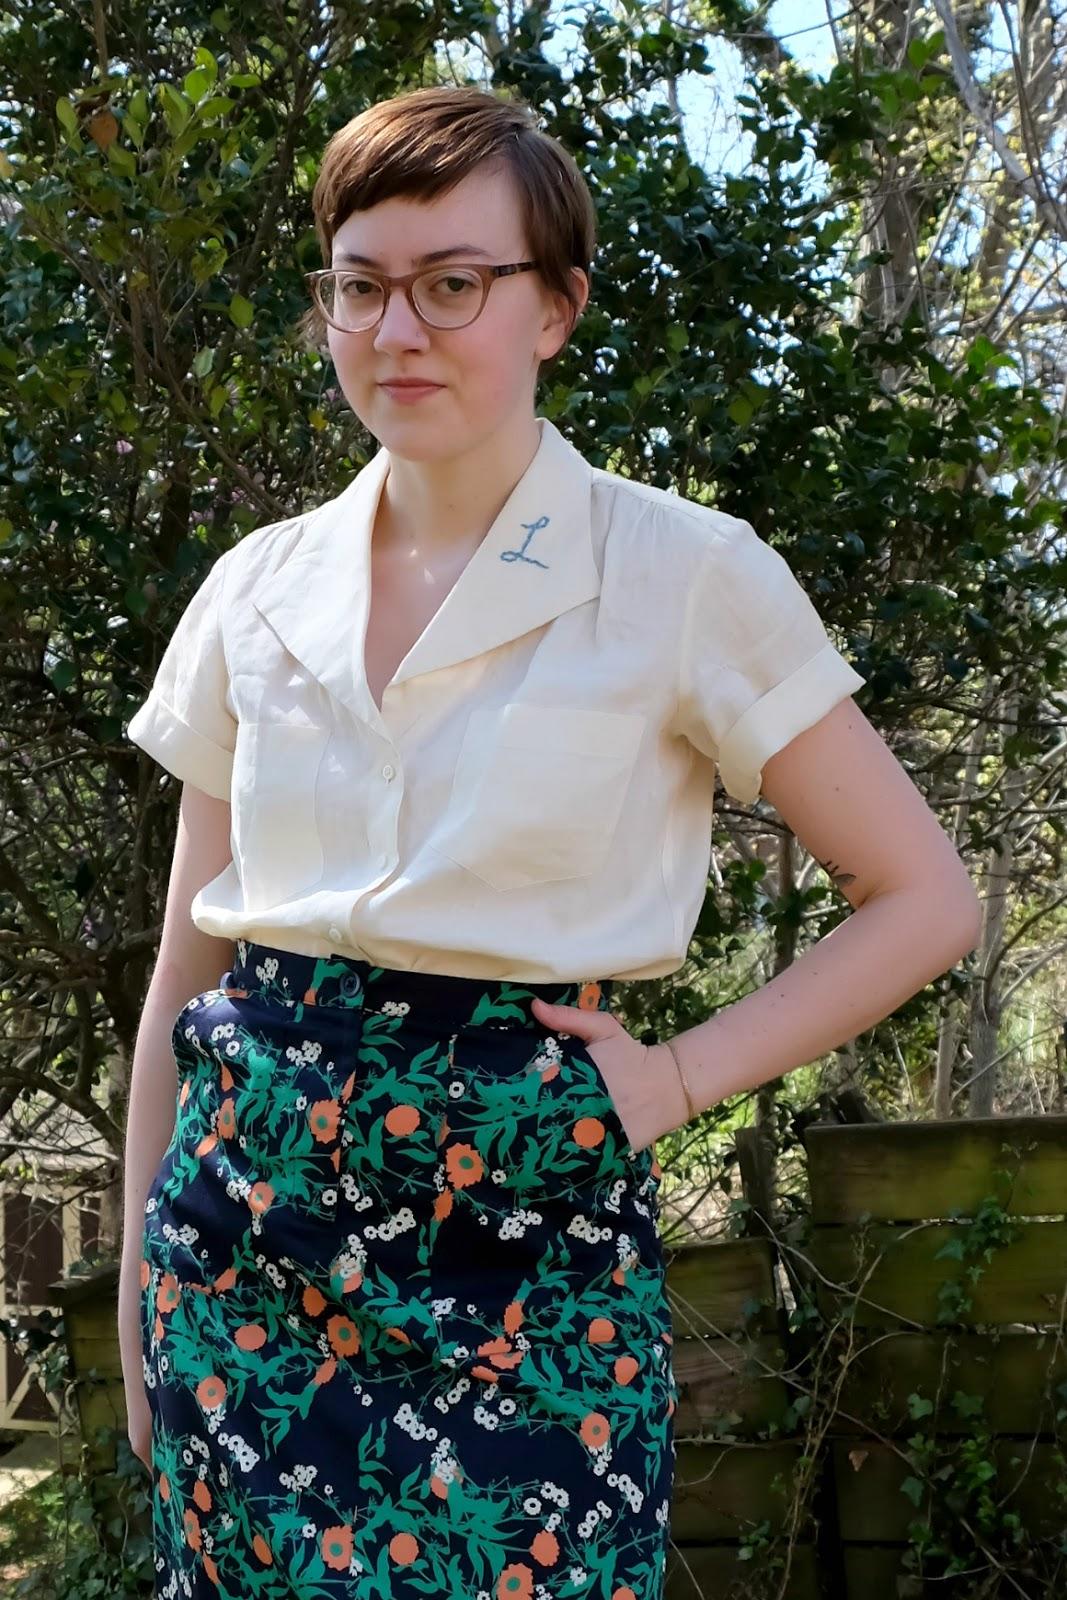 #haulternative fashion revolution week embroidered blouse DIY